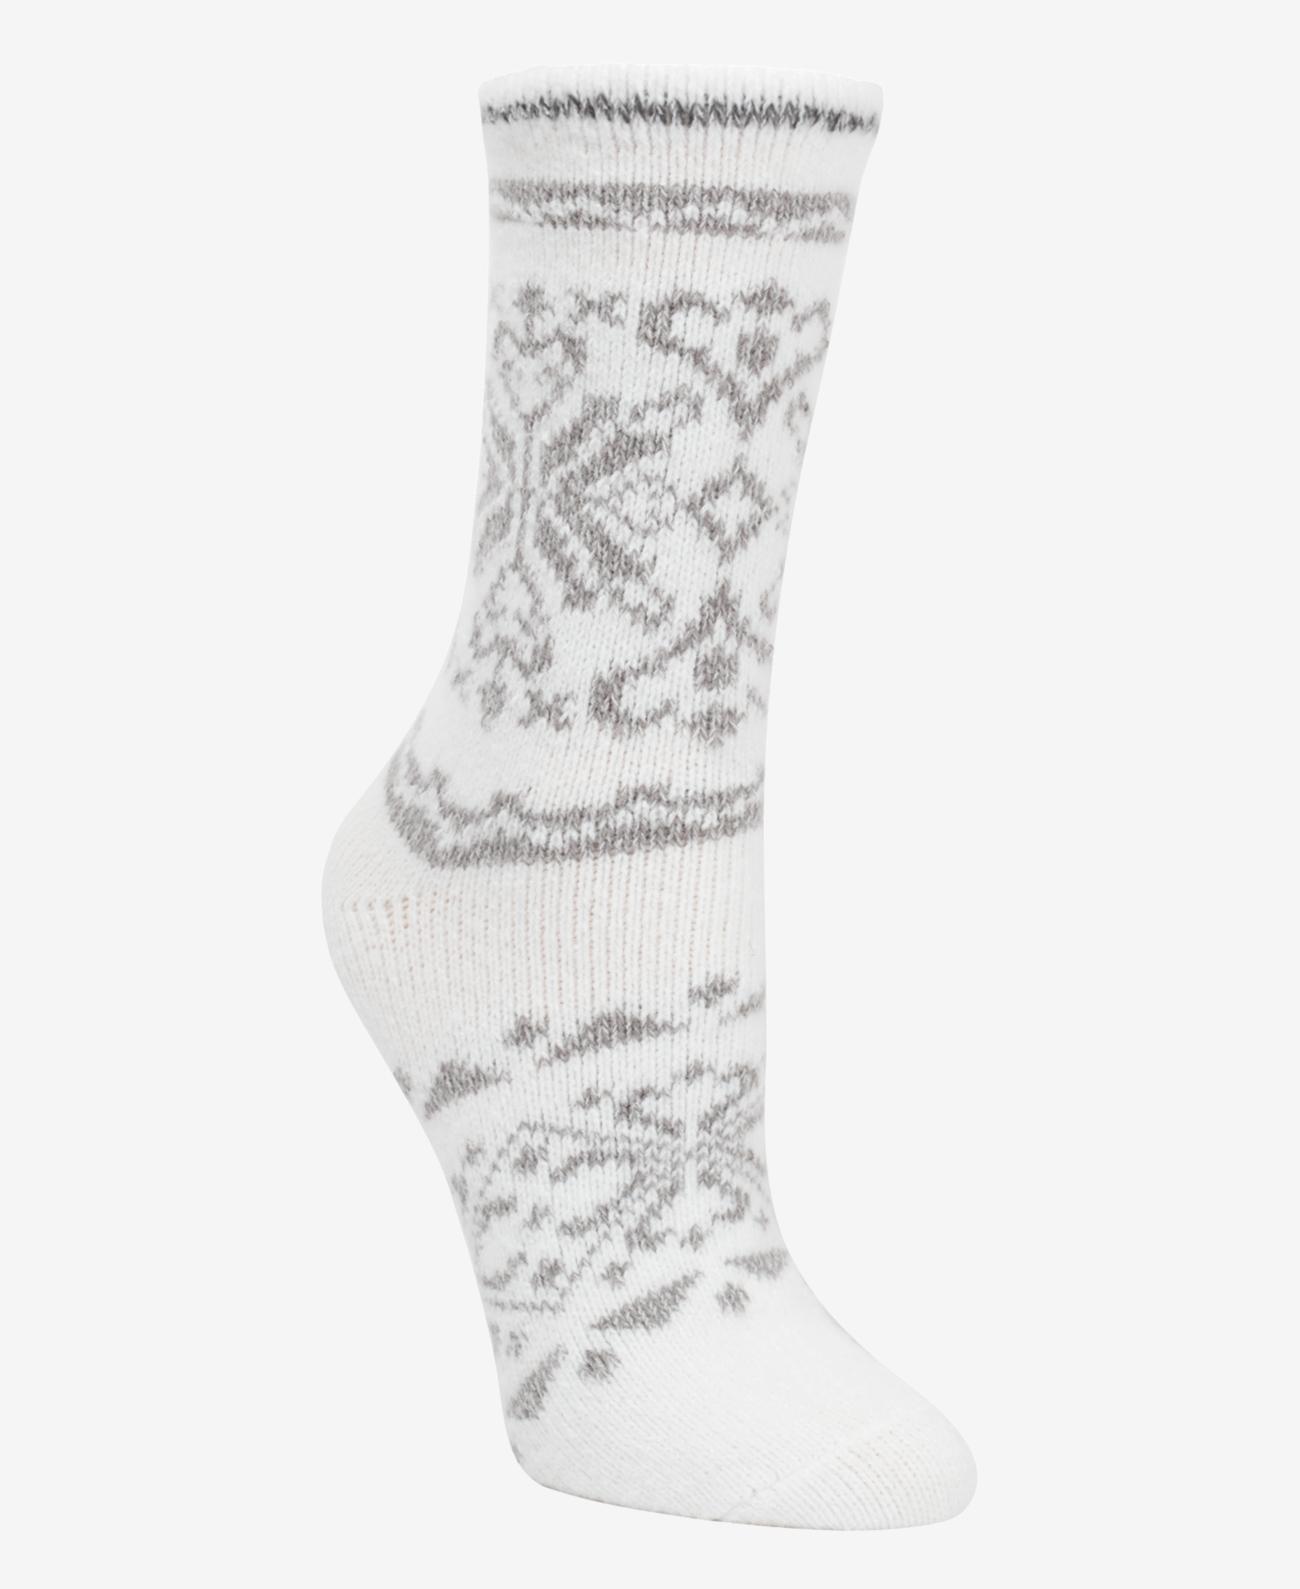 Cuddl Duds Women's Fairisle Boot Socks